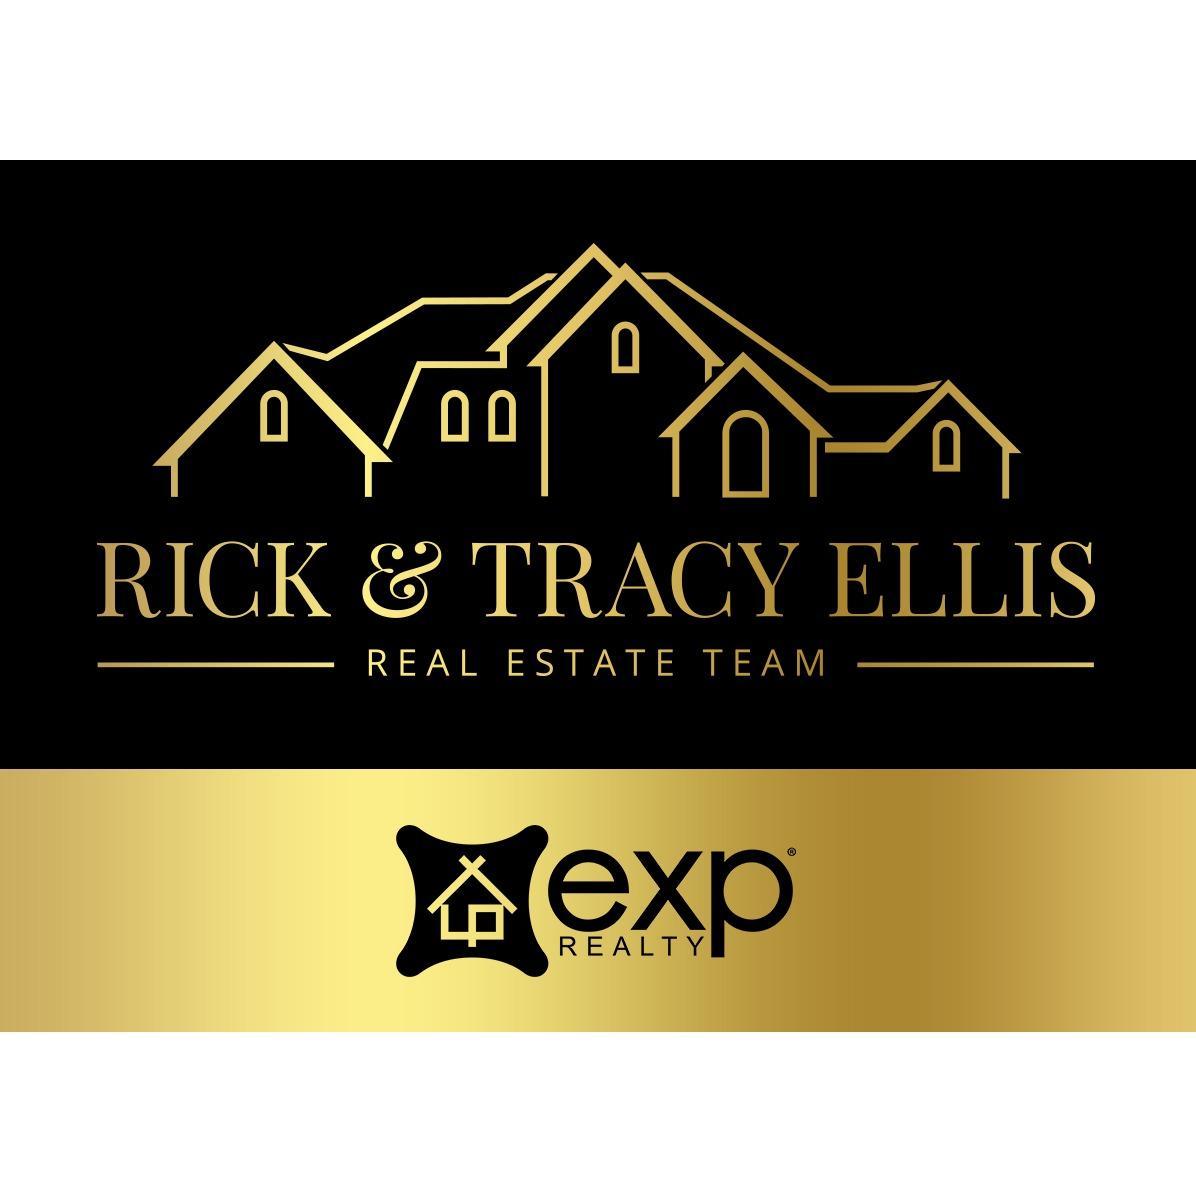 Rick & Tracy Ellis Team